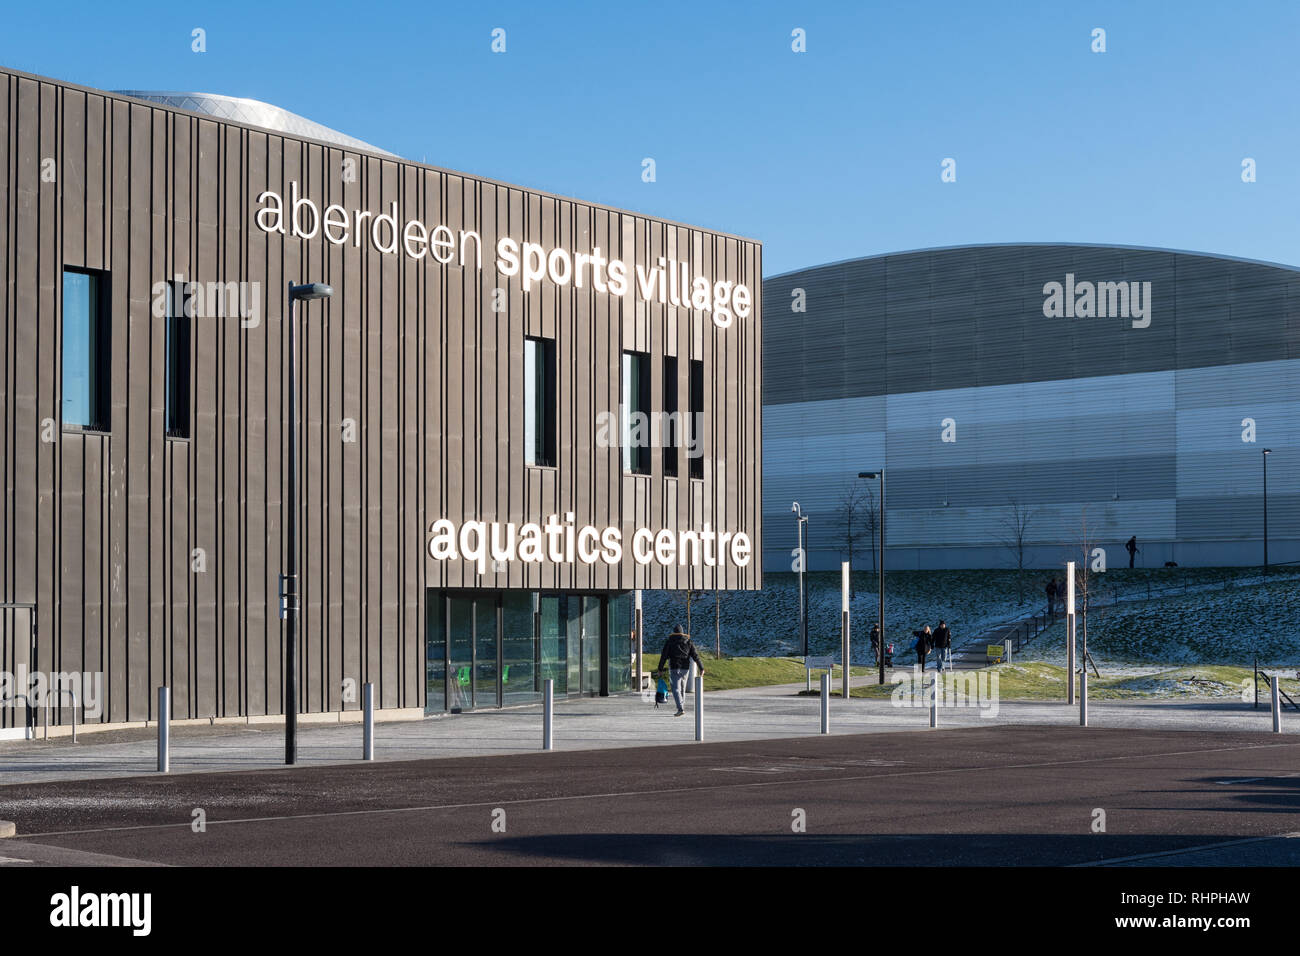 Aberdeen Sports Village y Aquatics Centre, Aberdeen, Escocia, Reino Unido Imagen De Stock